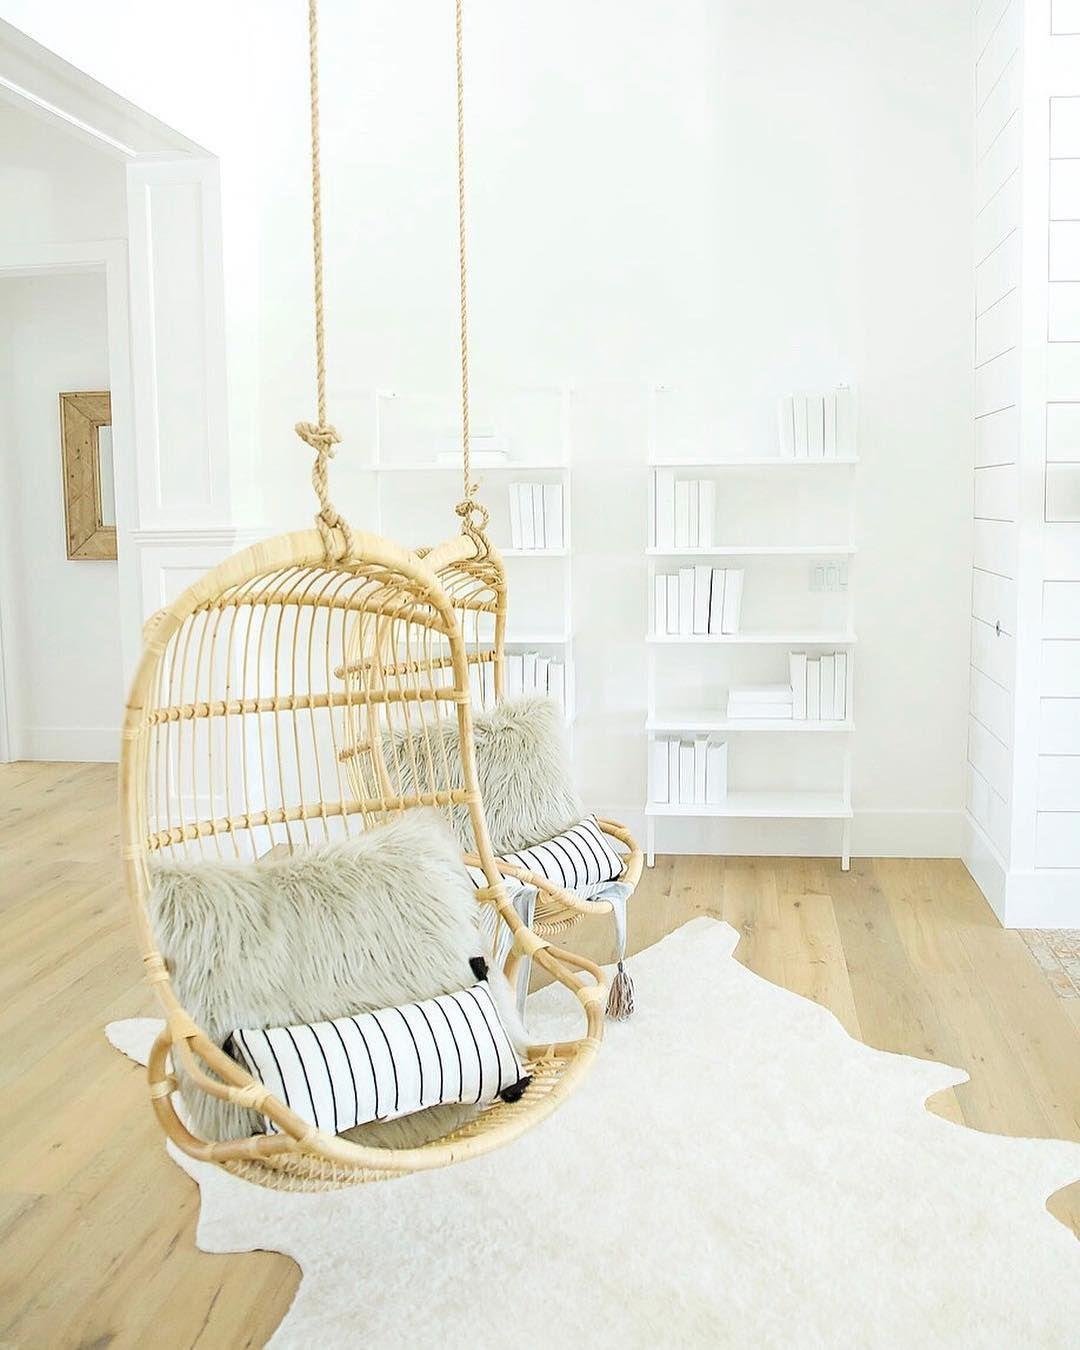 Image Via @lifestyledco | Hanging Rattan Chair Via Serena U0026 Lily